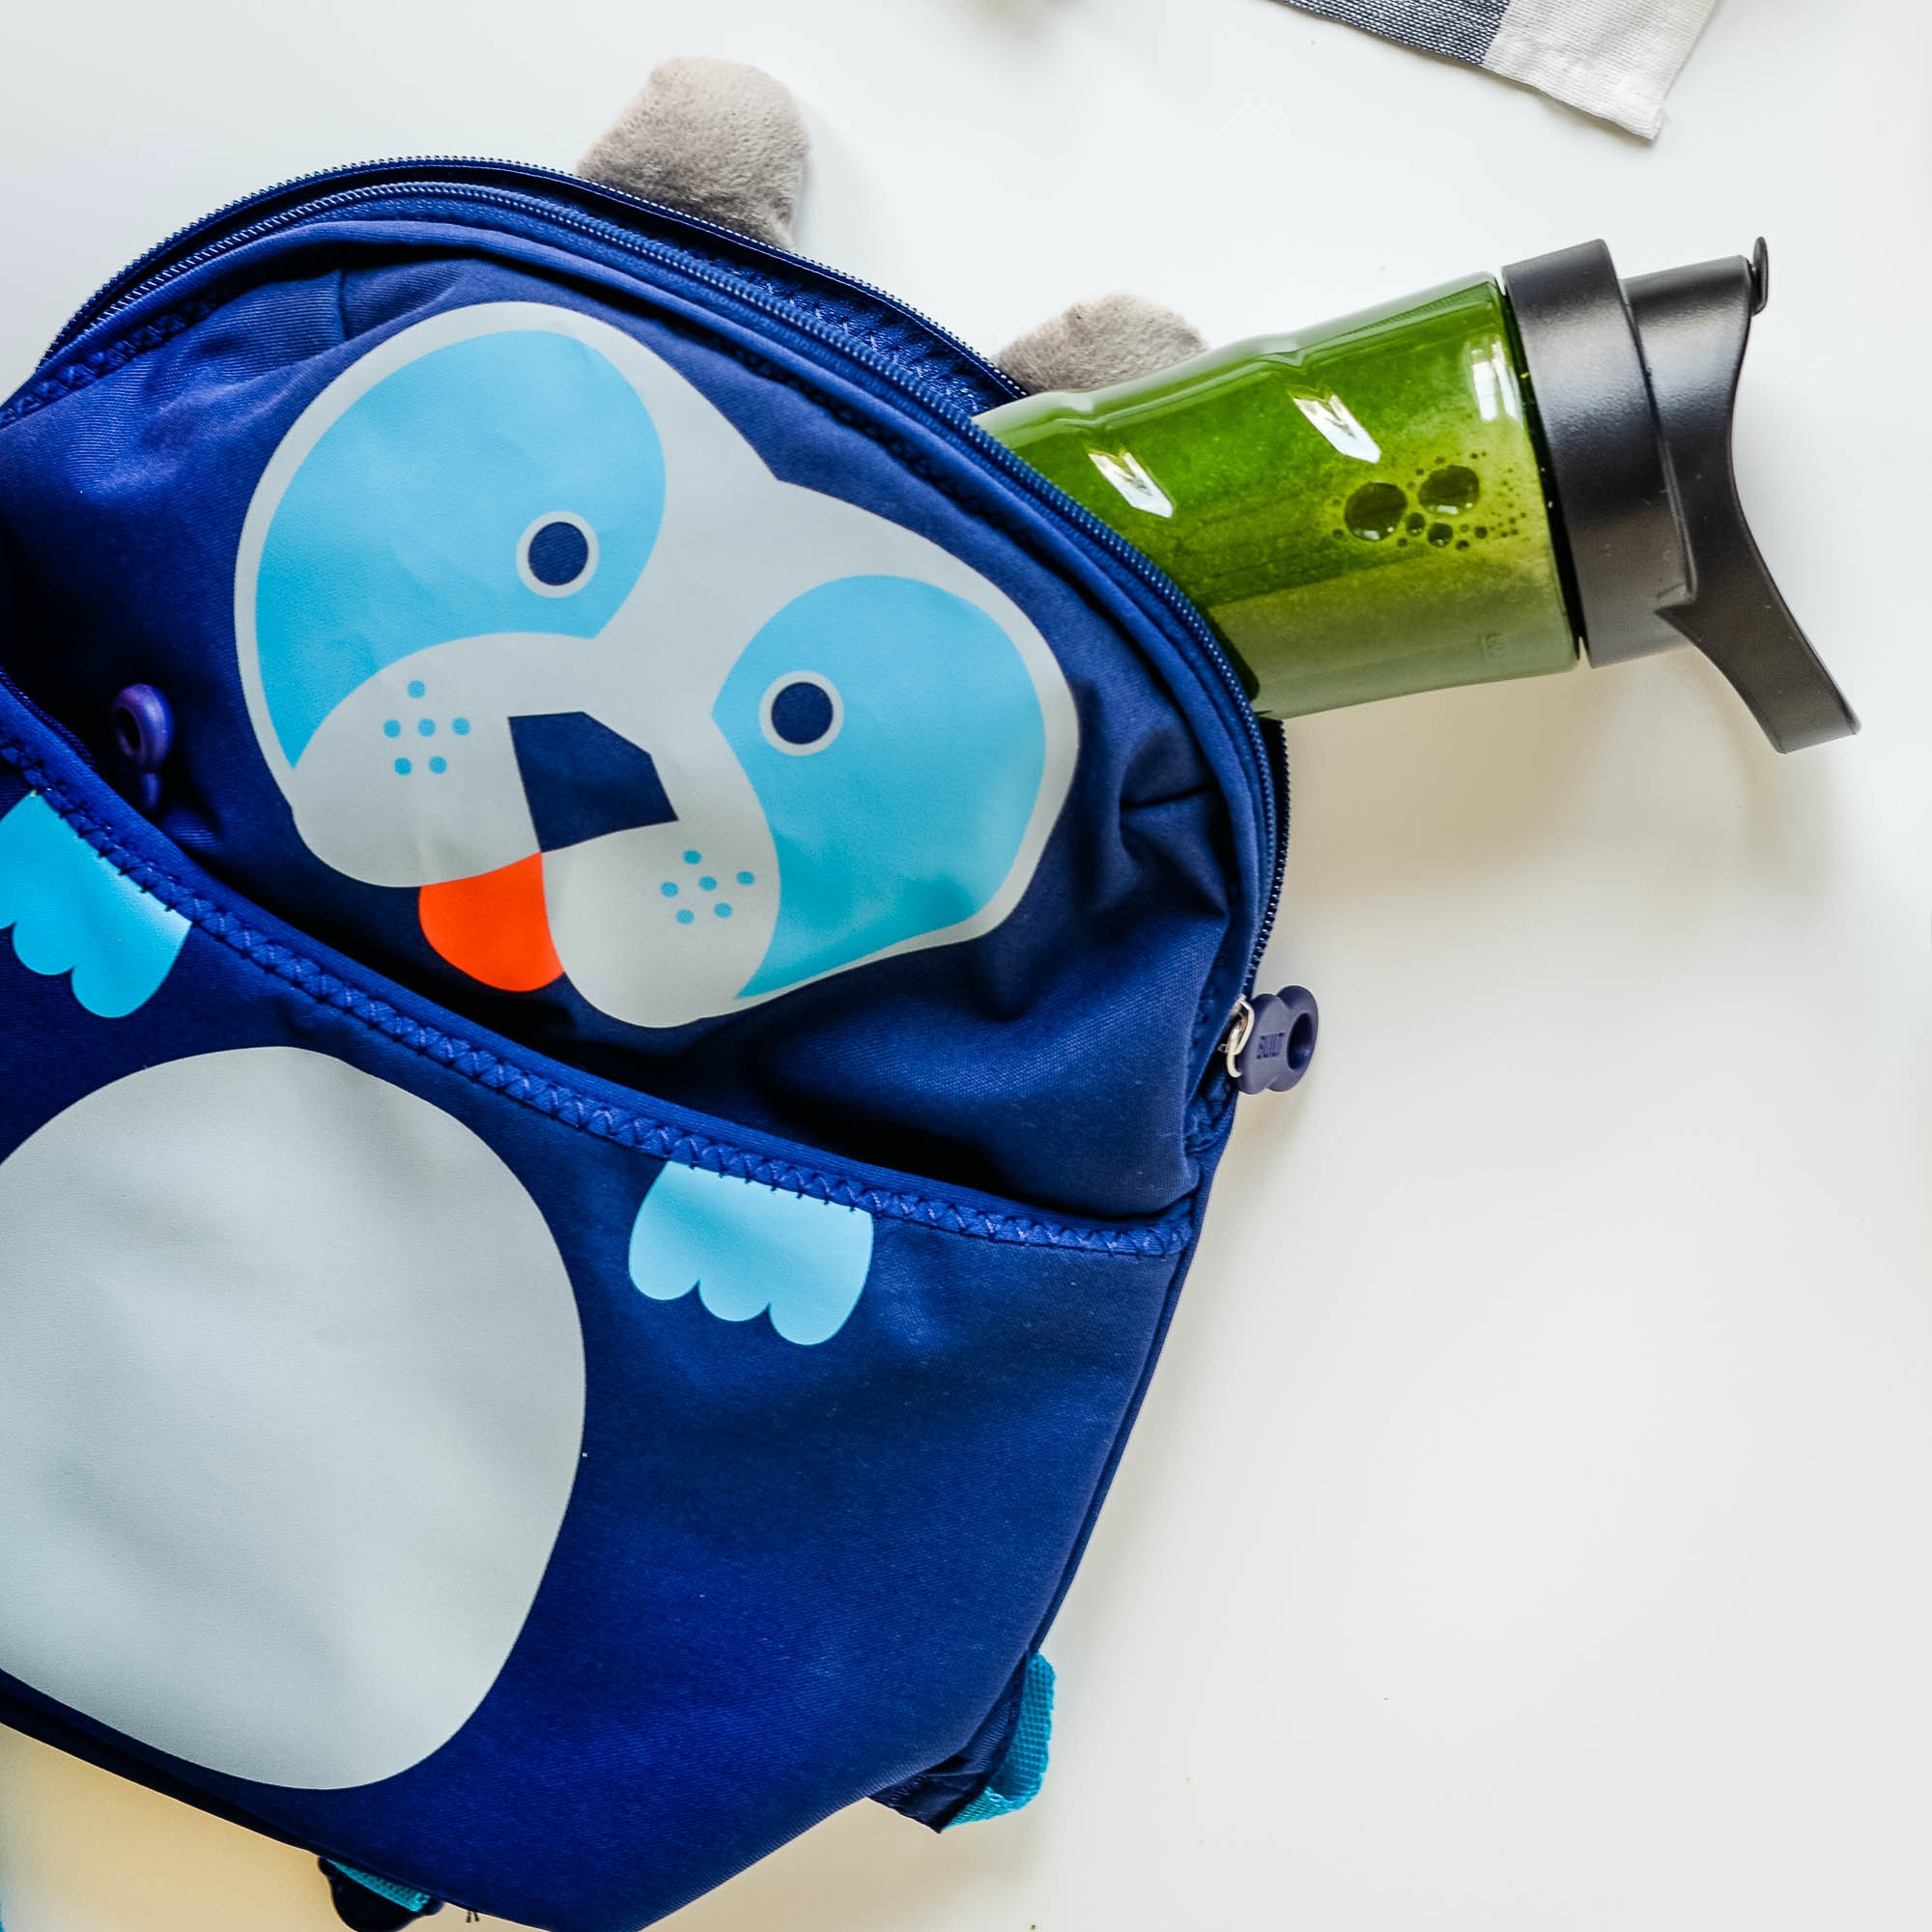 Btsbreakfast Backpack